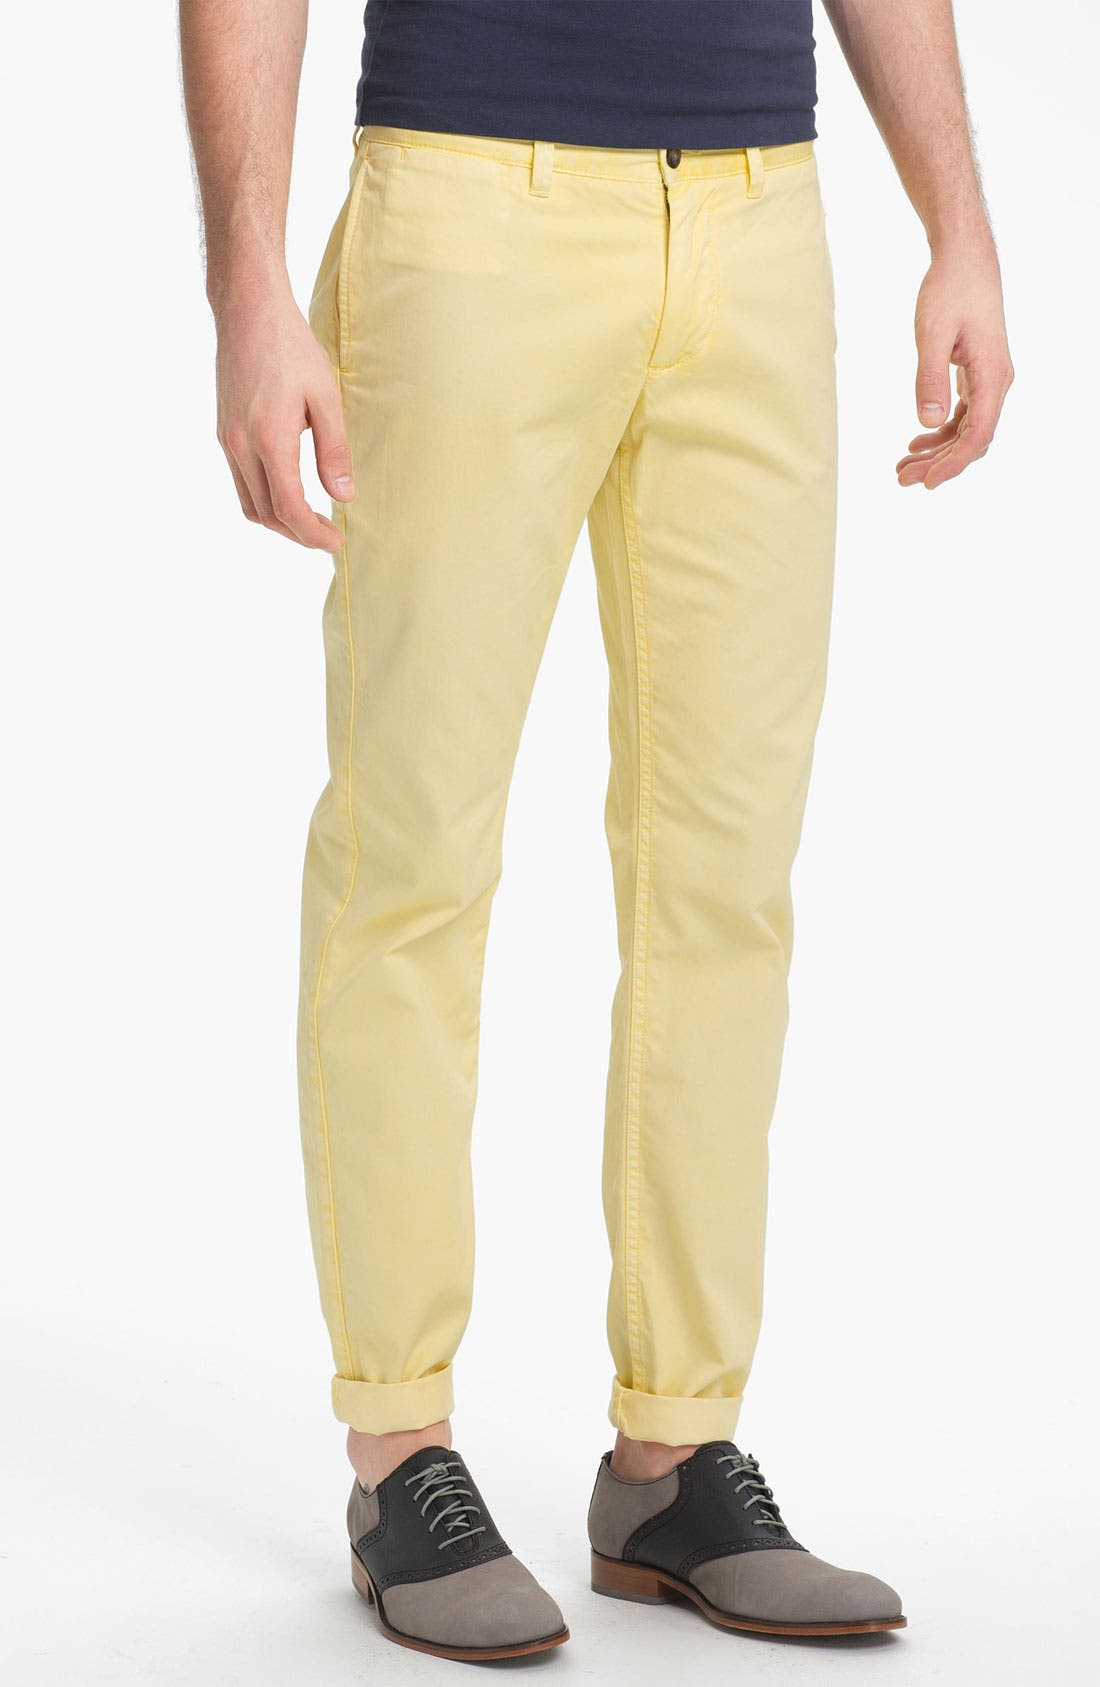 Alternate Image 1 Selected - Jack Spade Woven Shirt & Slim Fit Chinos